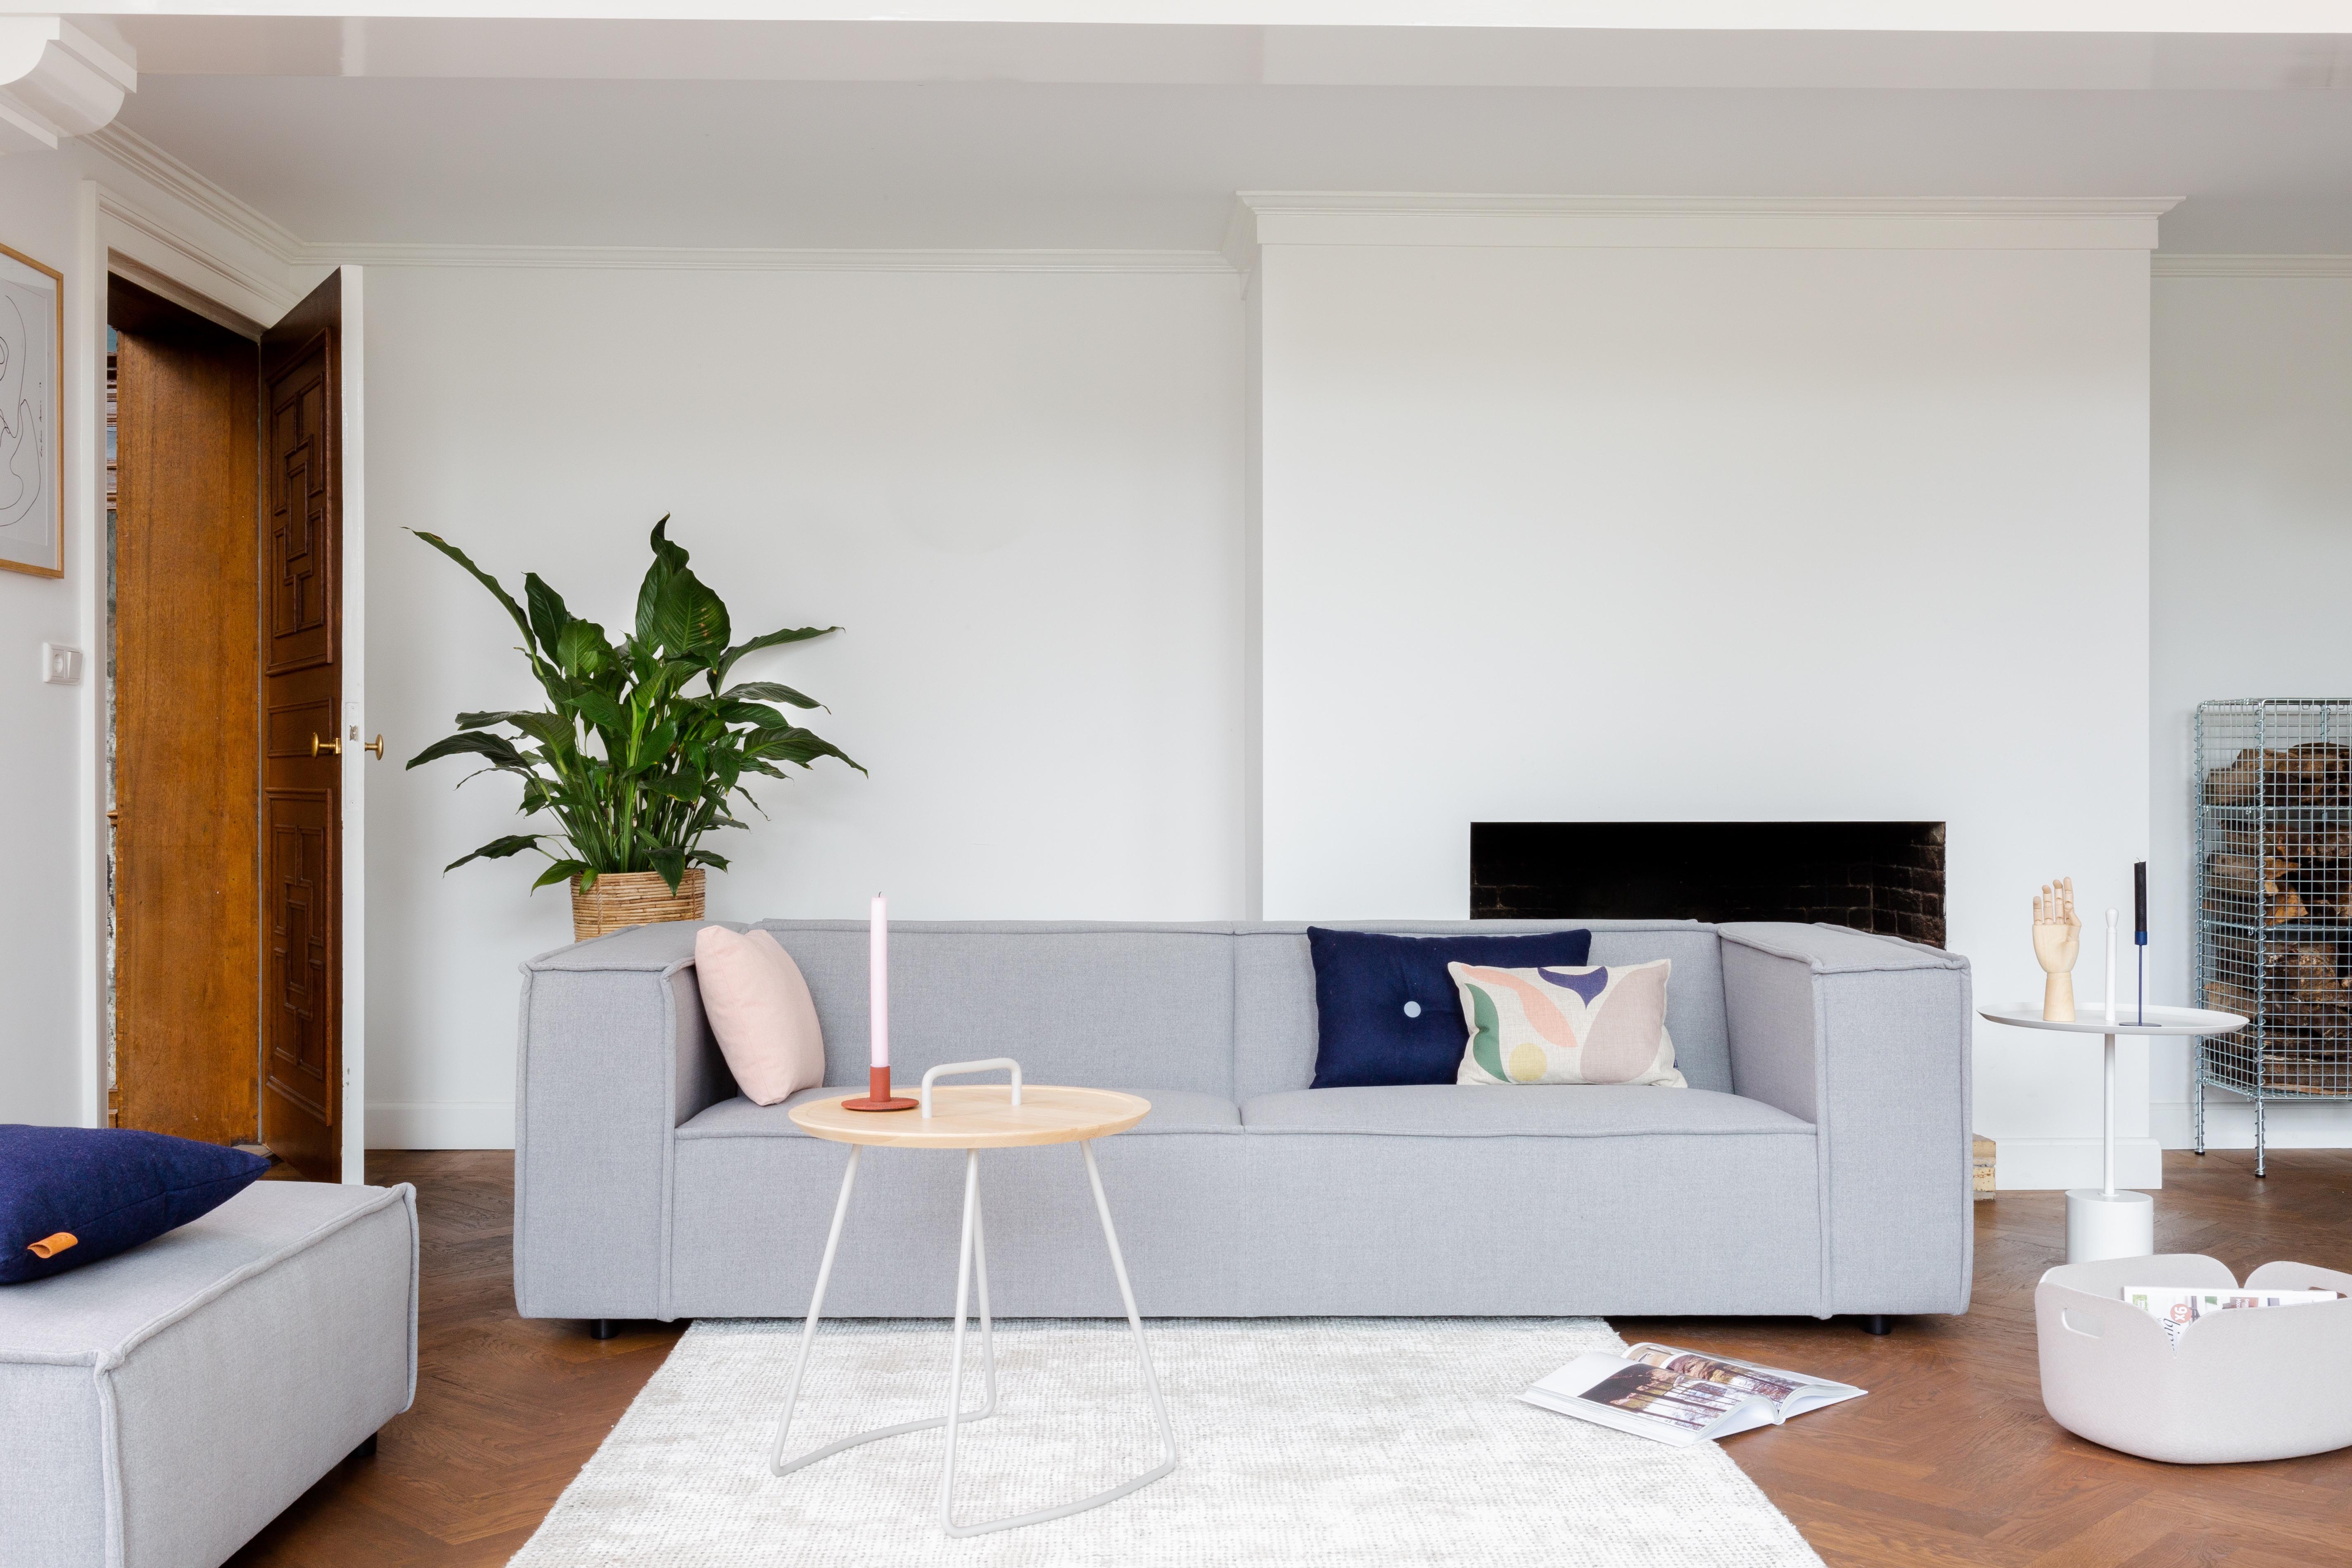 Design Bank Met Hocker.Knud Hocker Design Bankstellen Kopen By Sidde